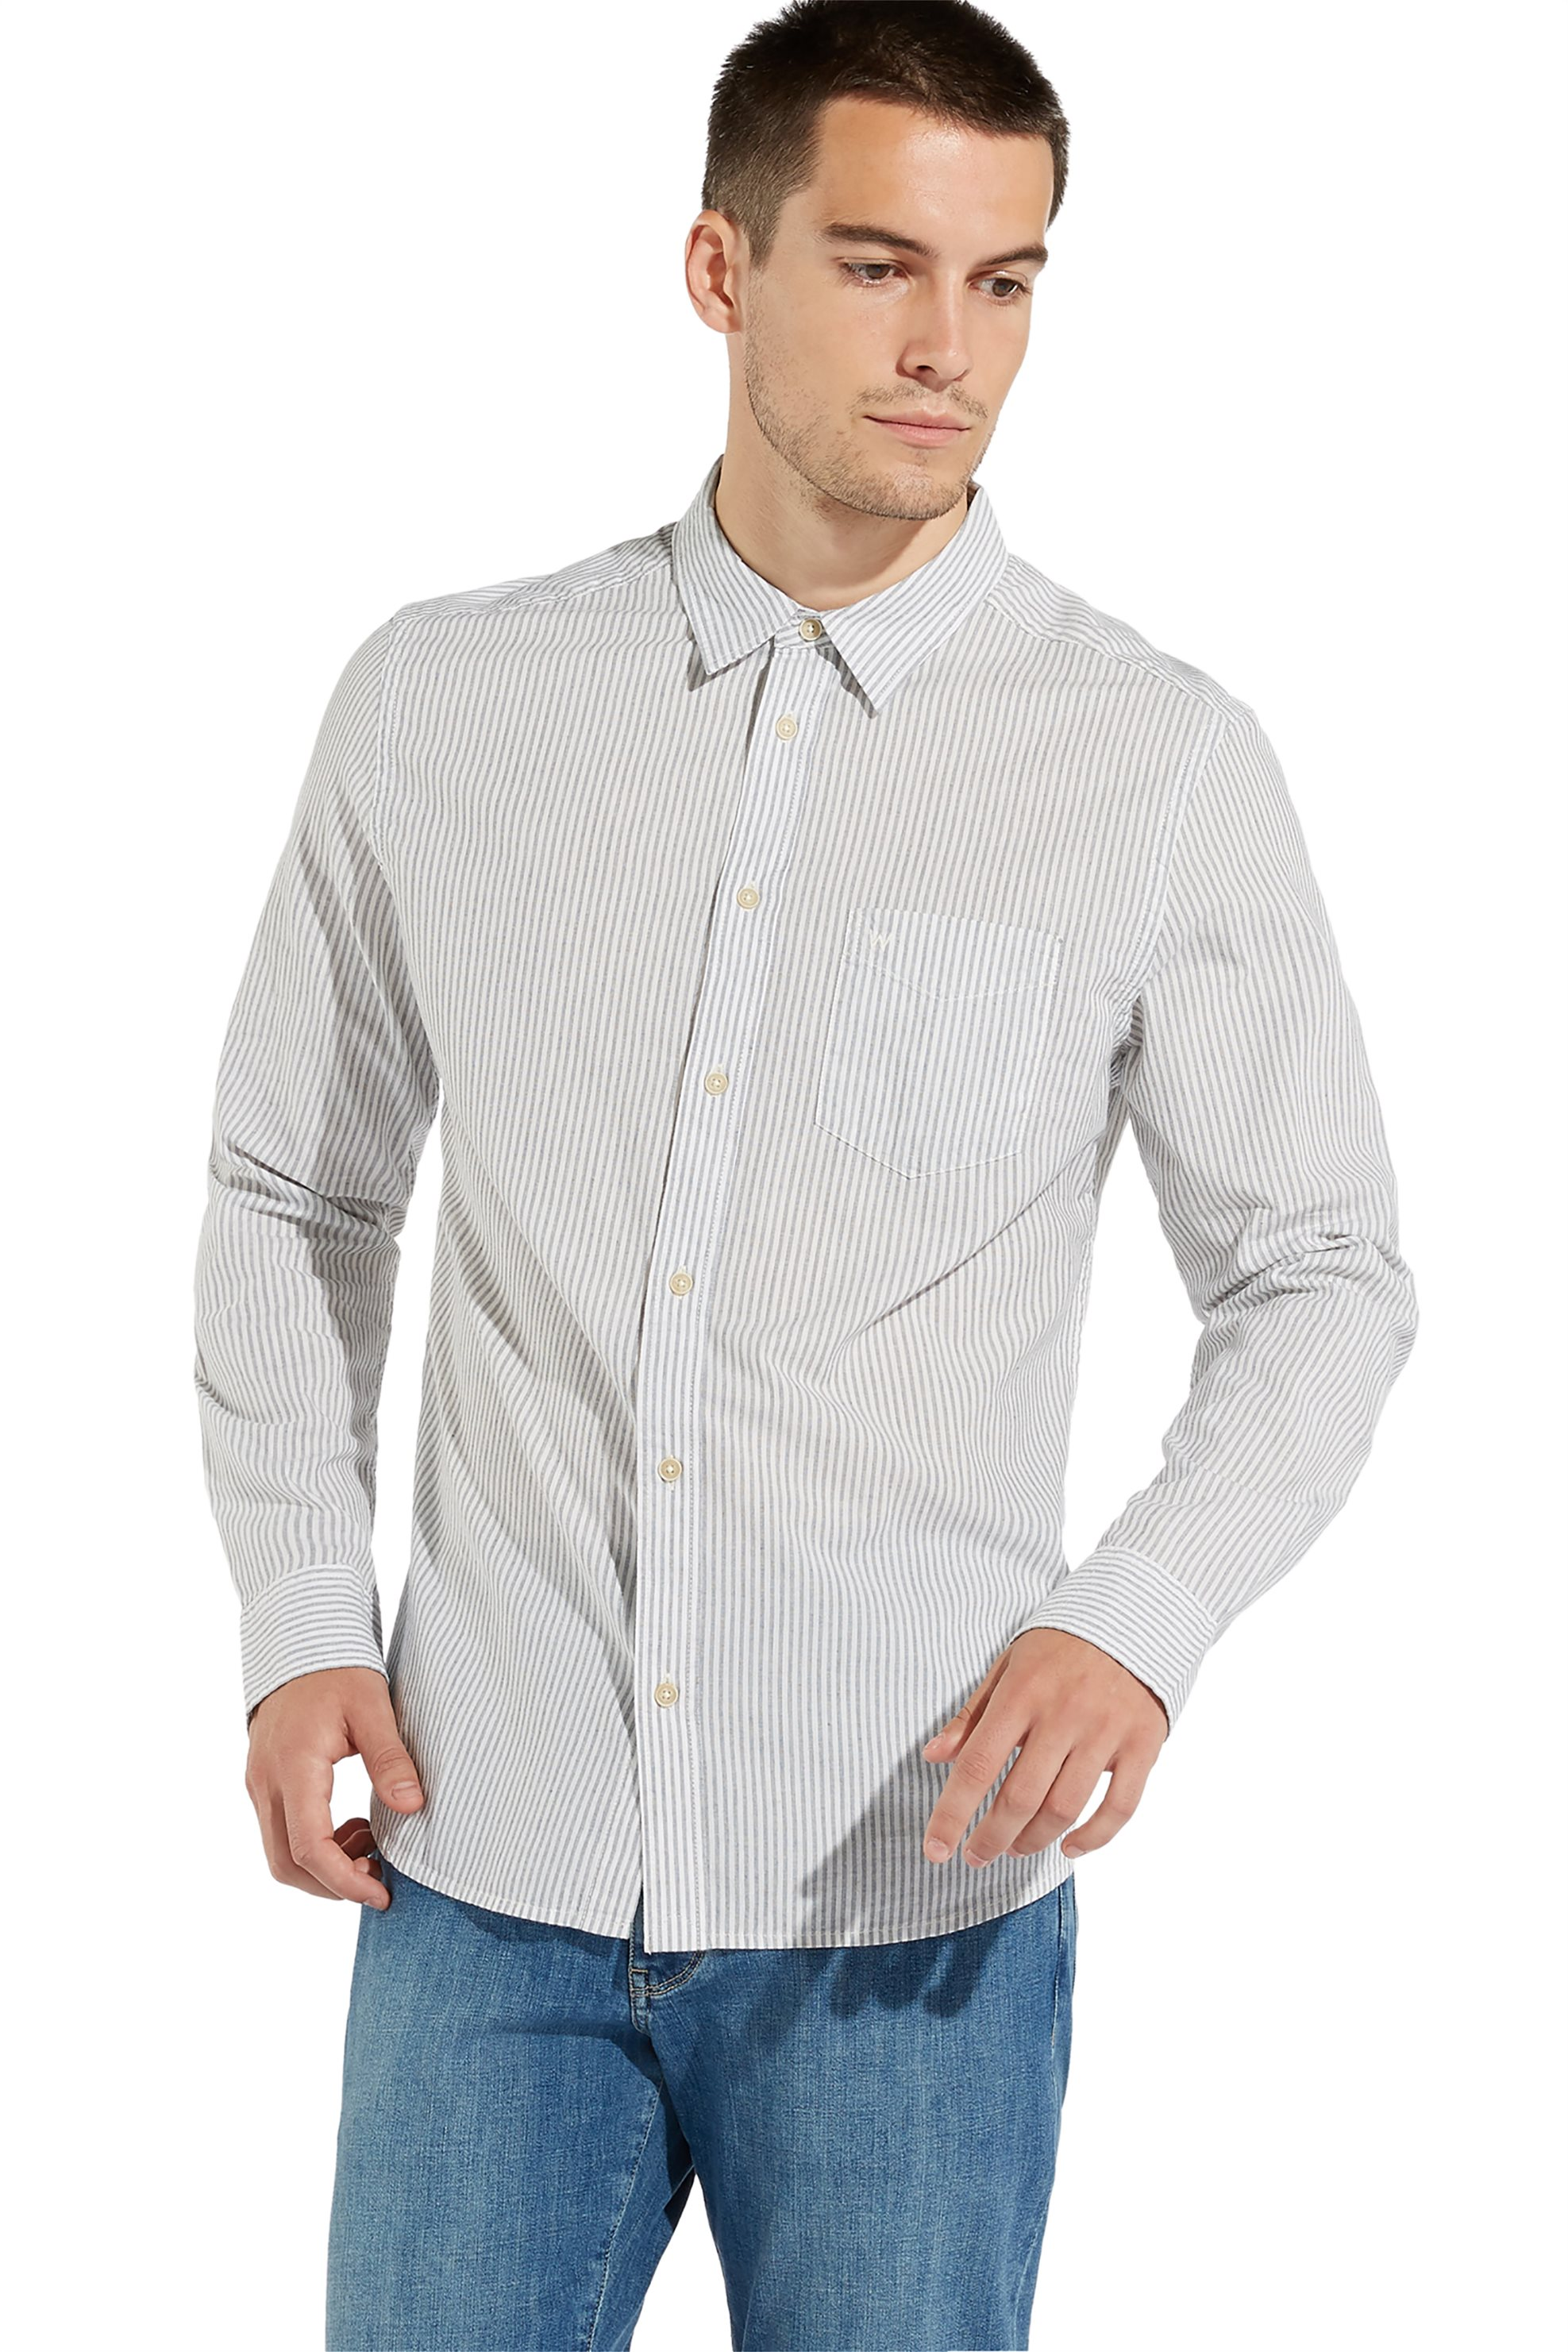 a9e5c0072f26 Notos Wrangler ανδρικό πουκάμισο One Pocket Navy - W5760MN35 - Γκρι